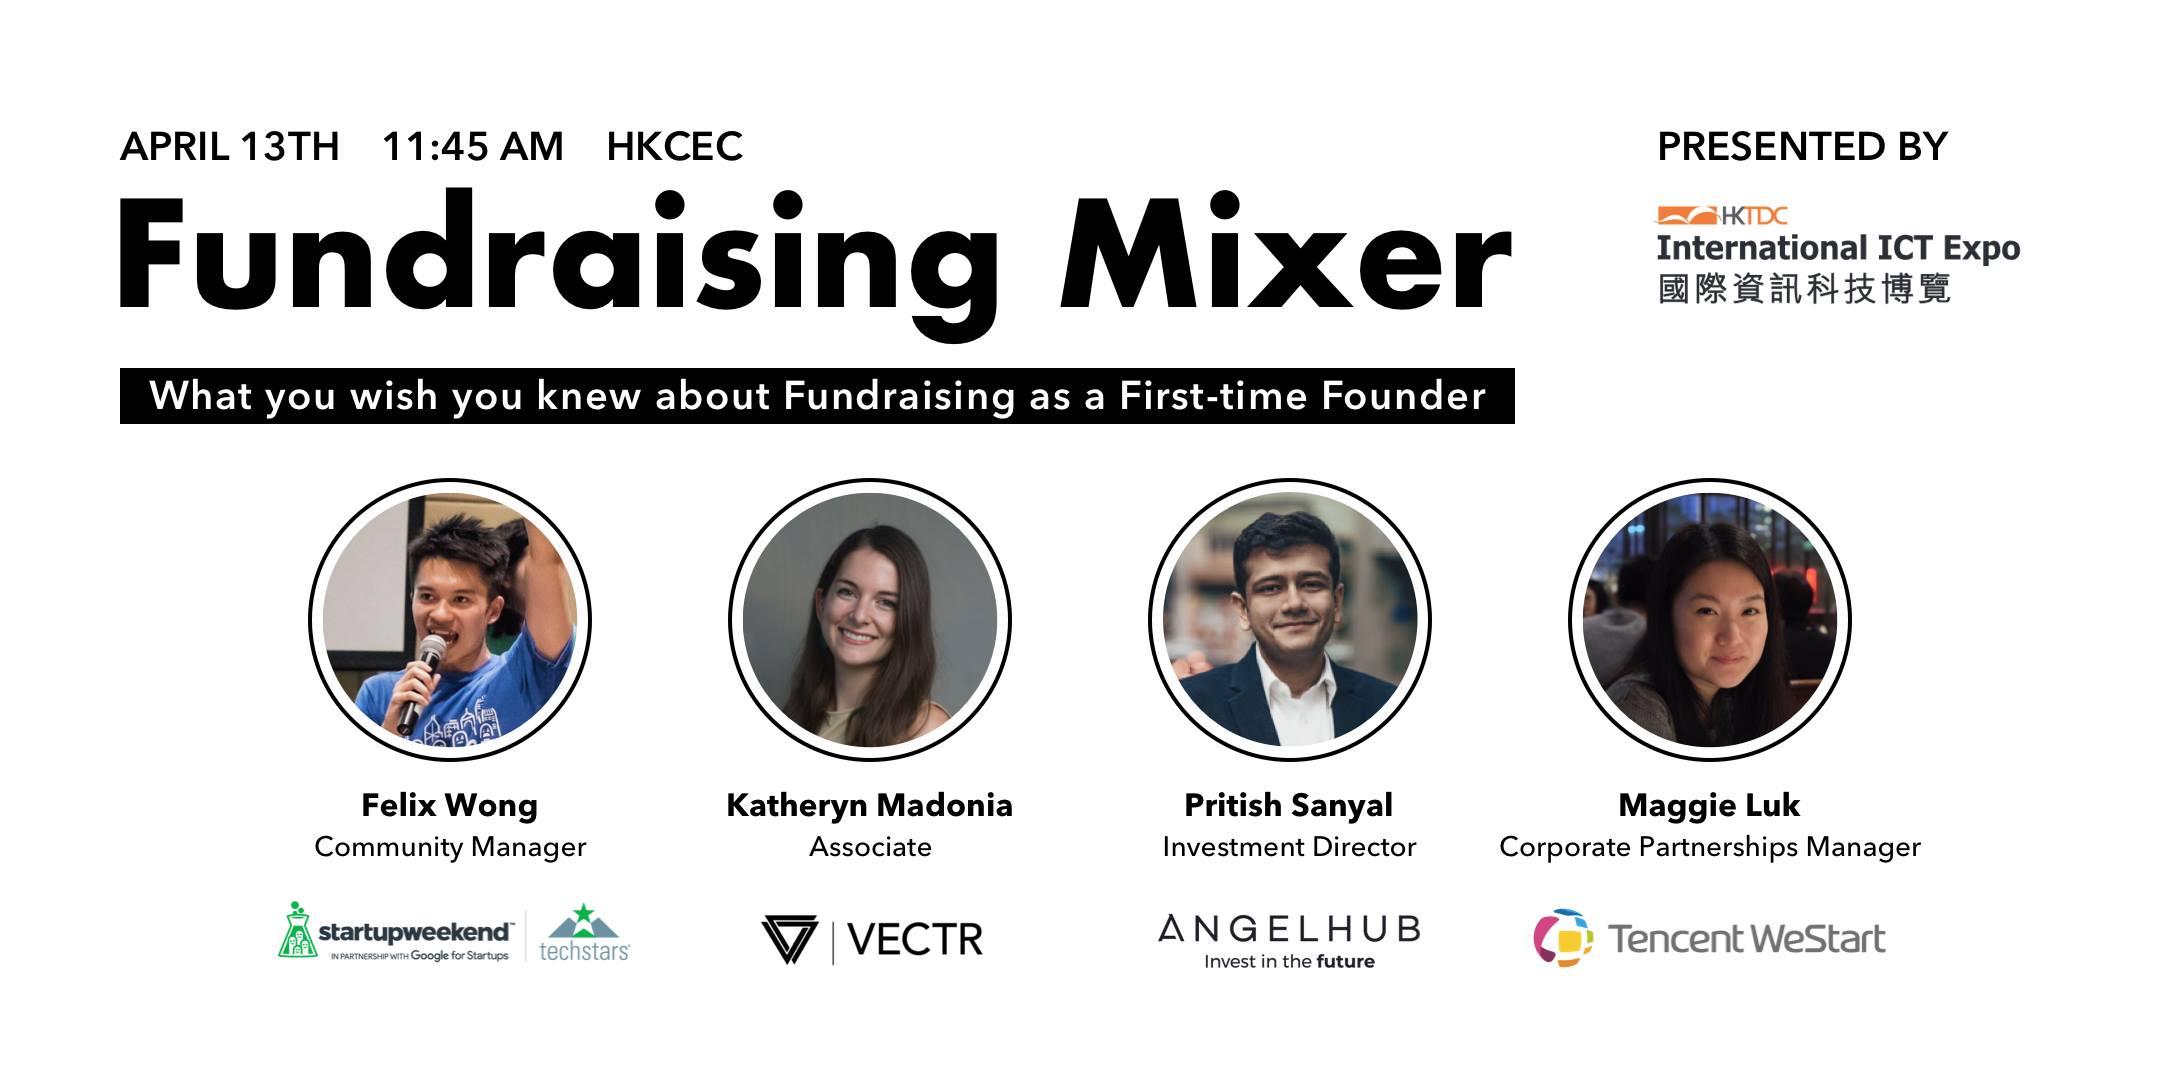 Fundraising mixer HKTDC